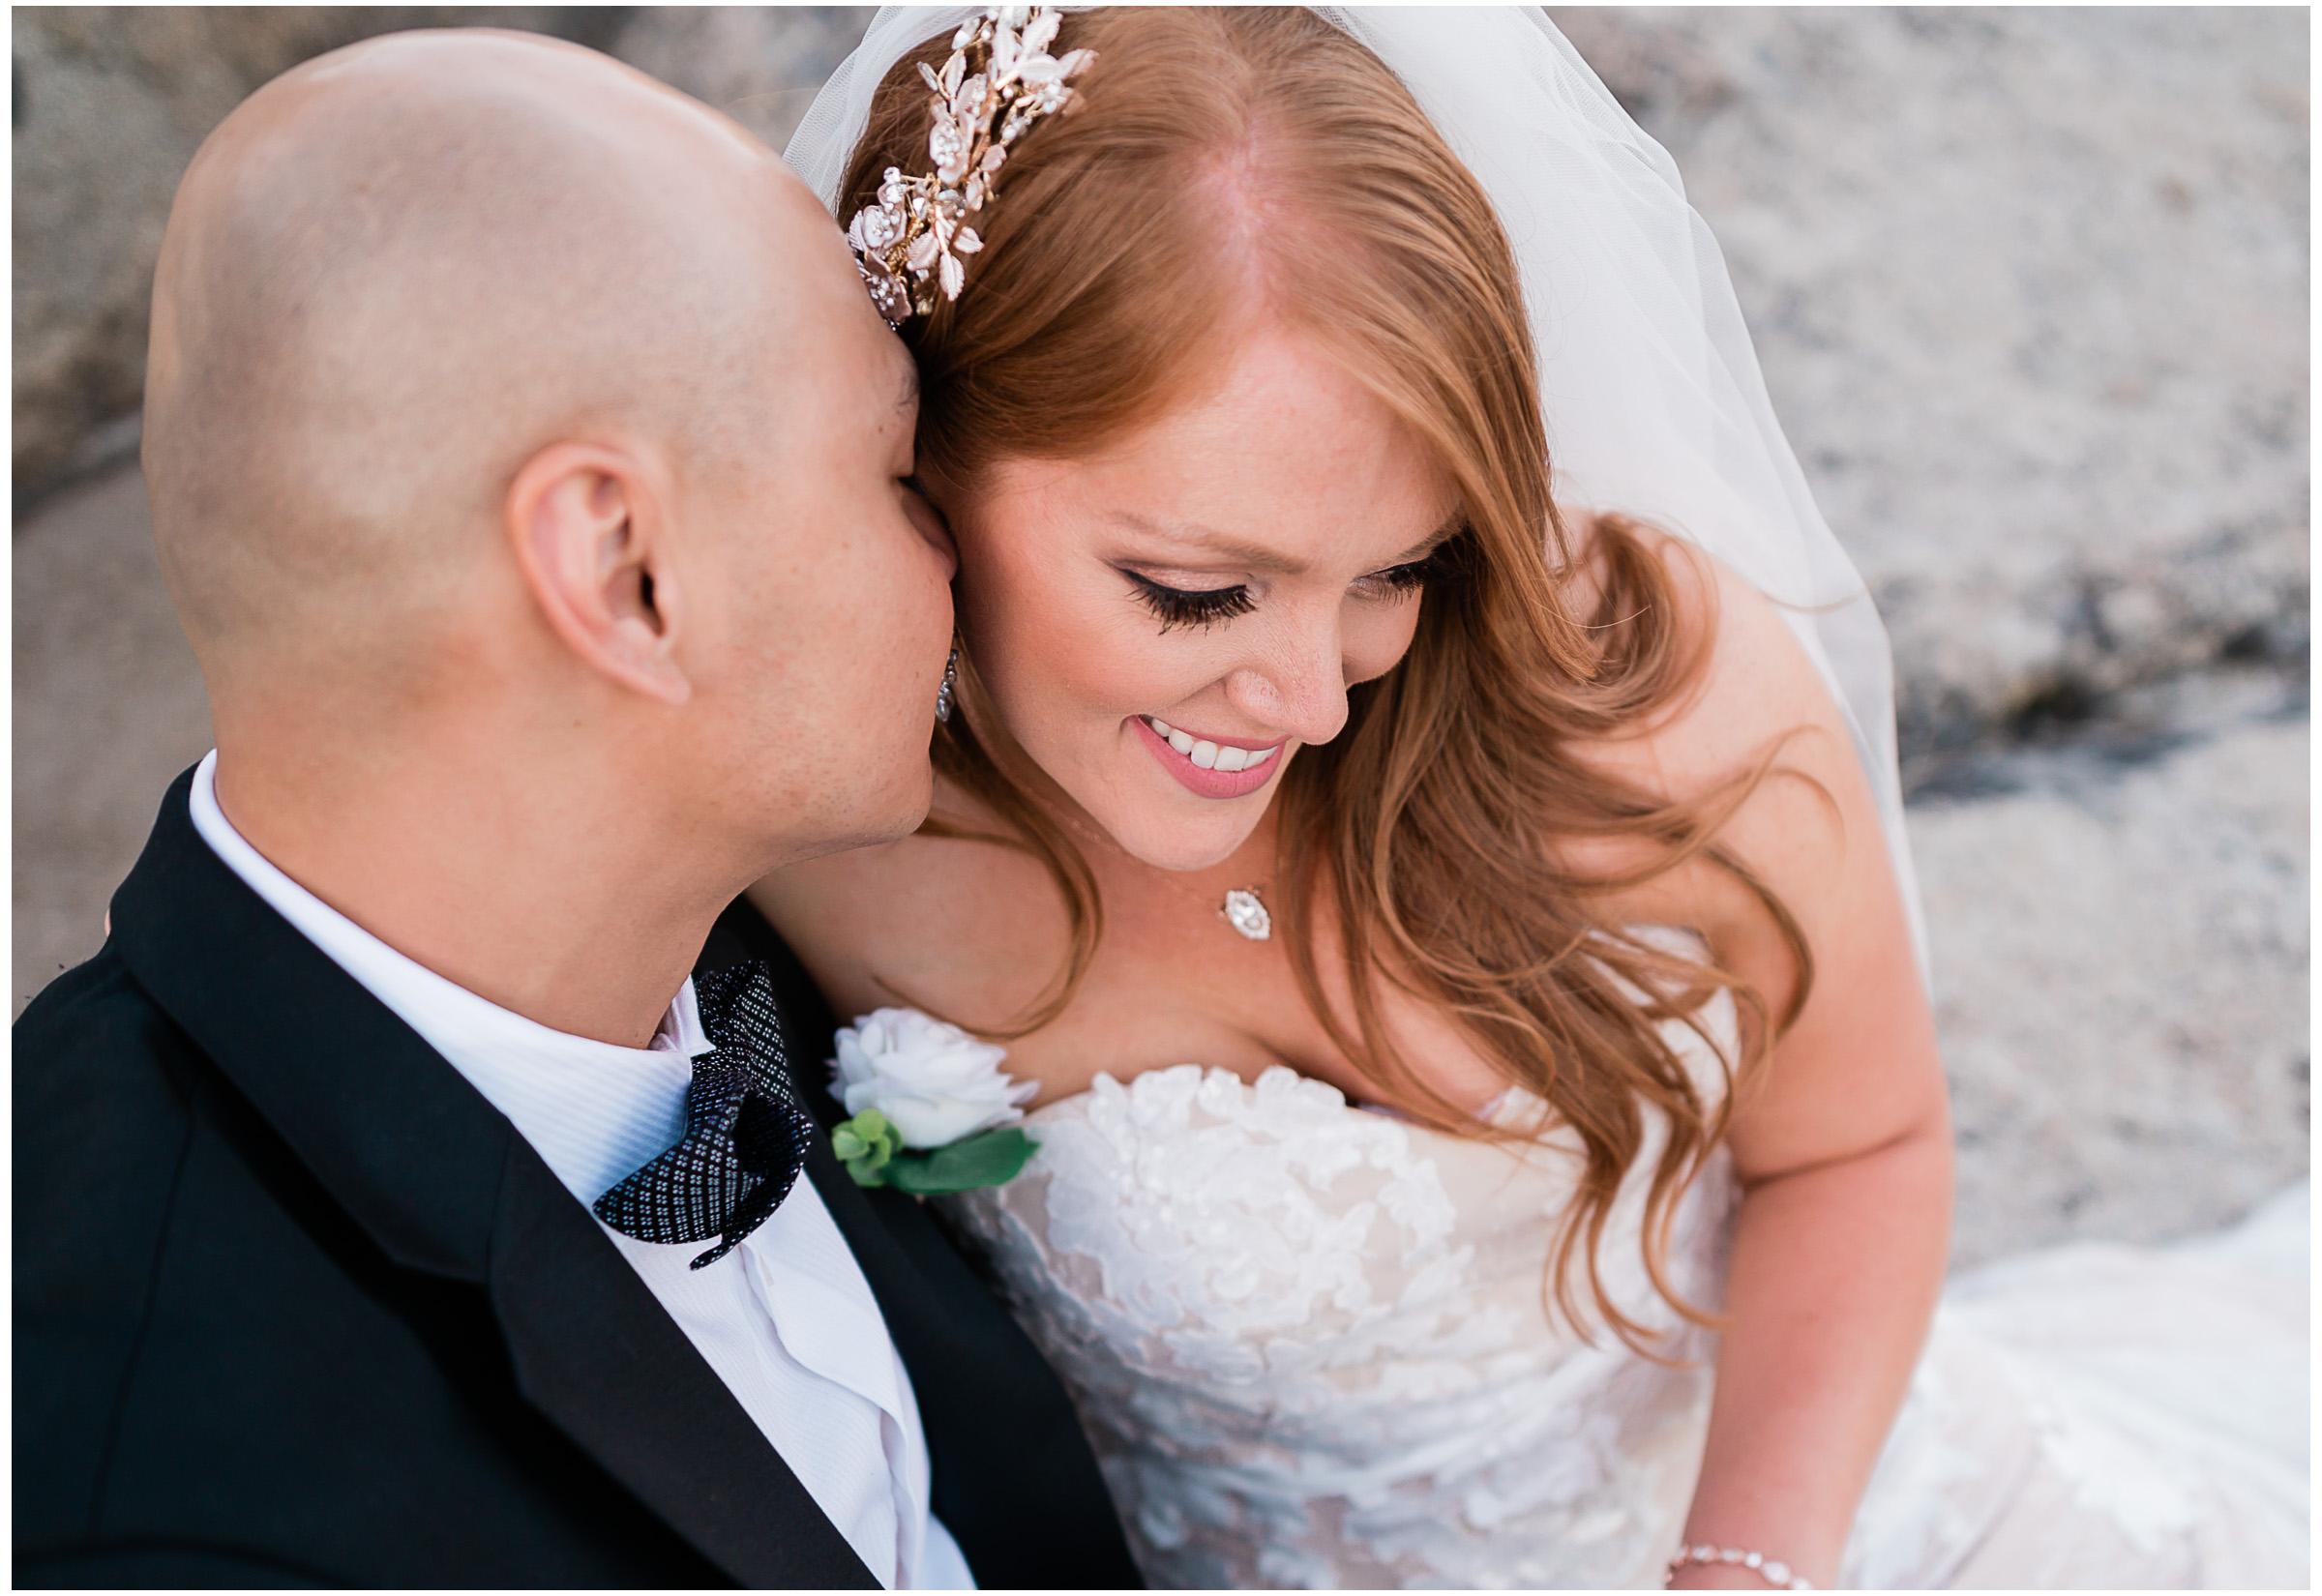 Clarksburg Wedding - Sacramento Photographer - Bogle Winery - Justin Wilcox Photography - 14.jpg